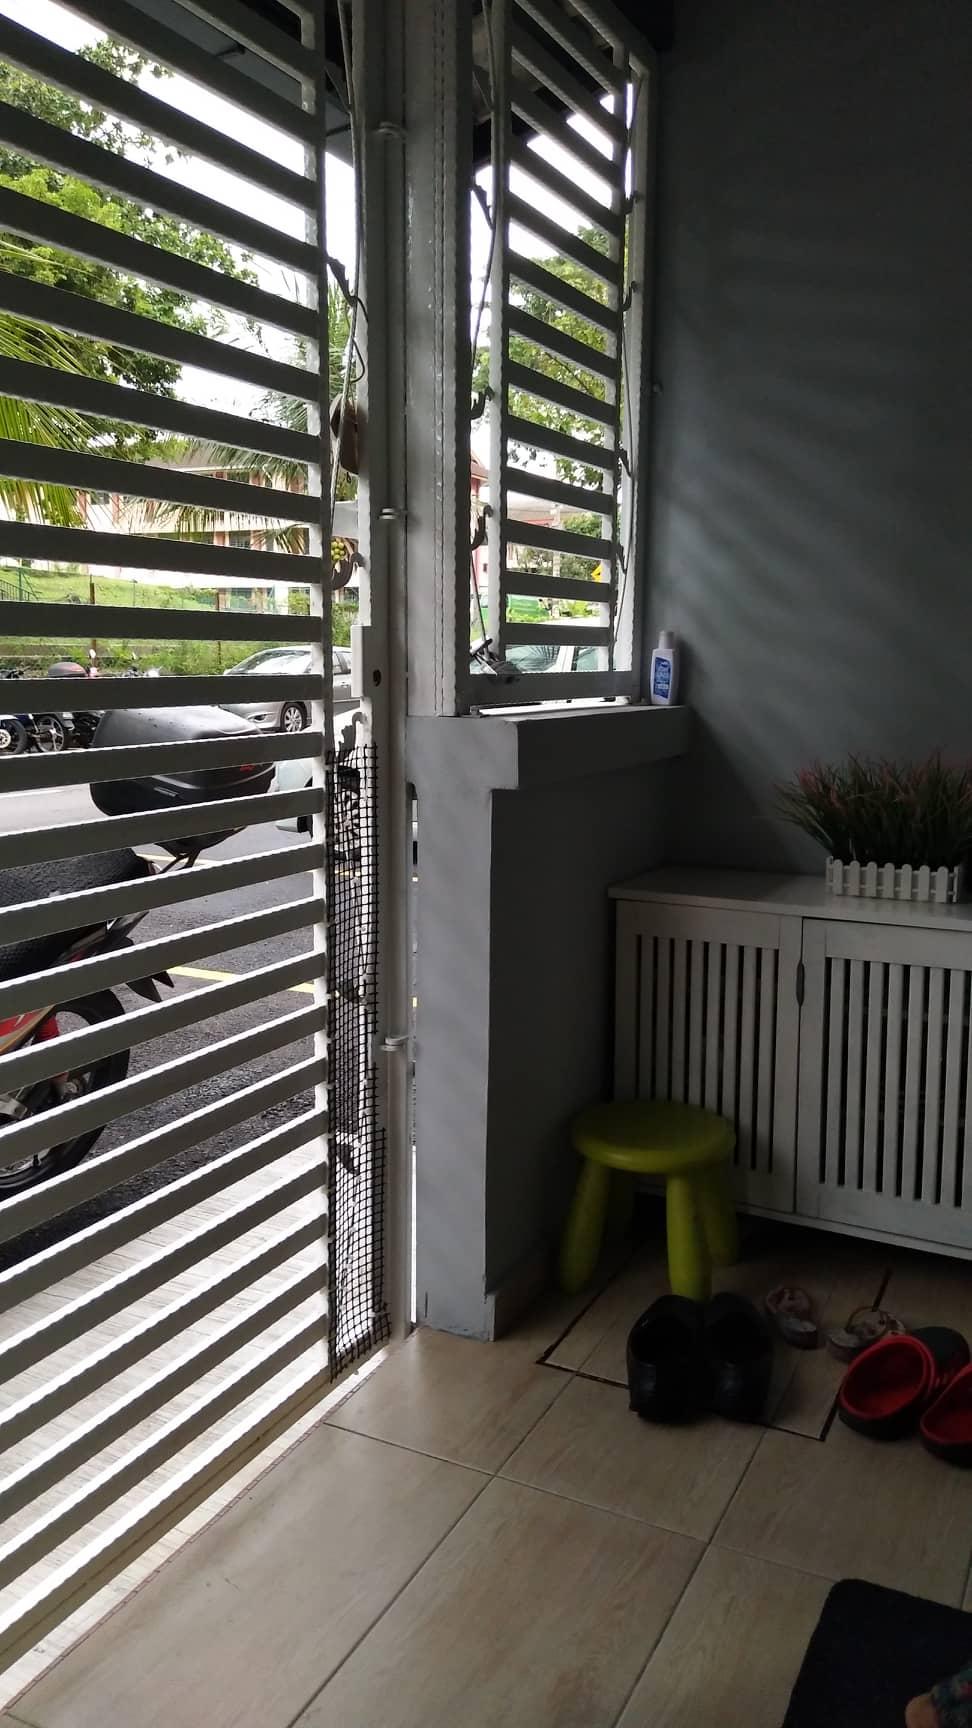 Kedudukan rumah di ground floor memudahkan lagi pemilik menghias rumah dengn cantik dan tersusun